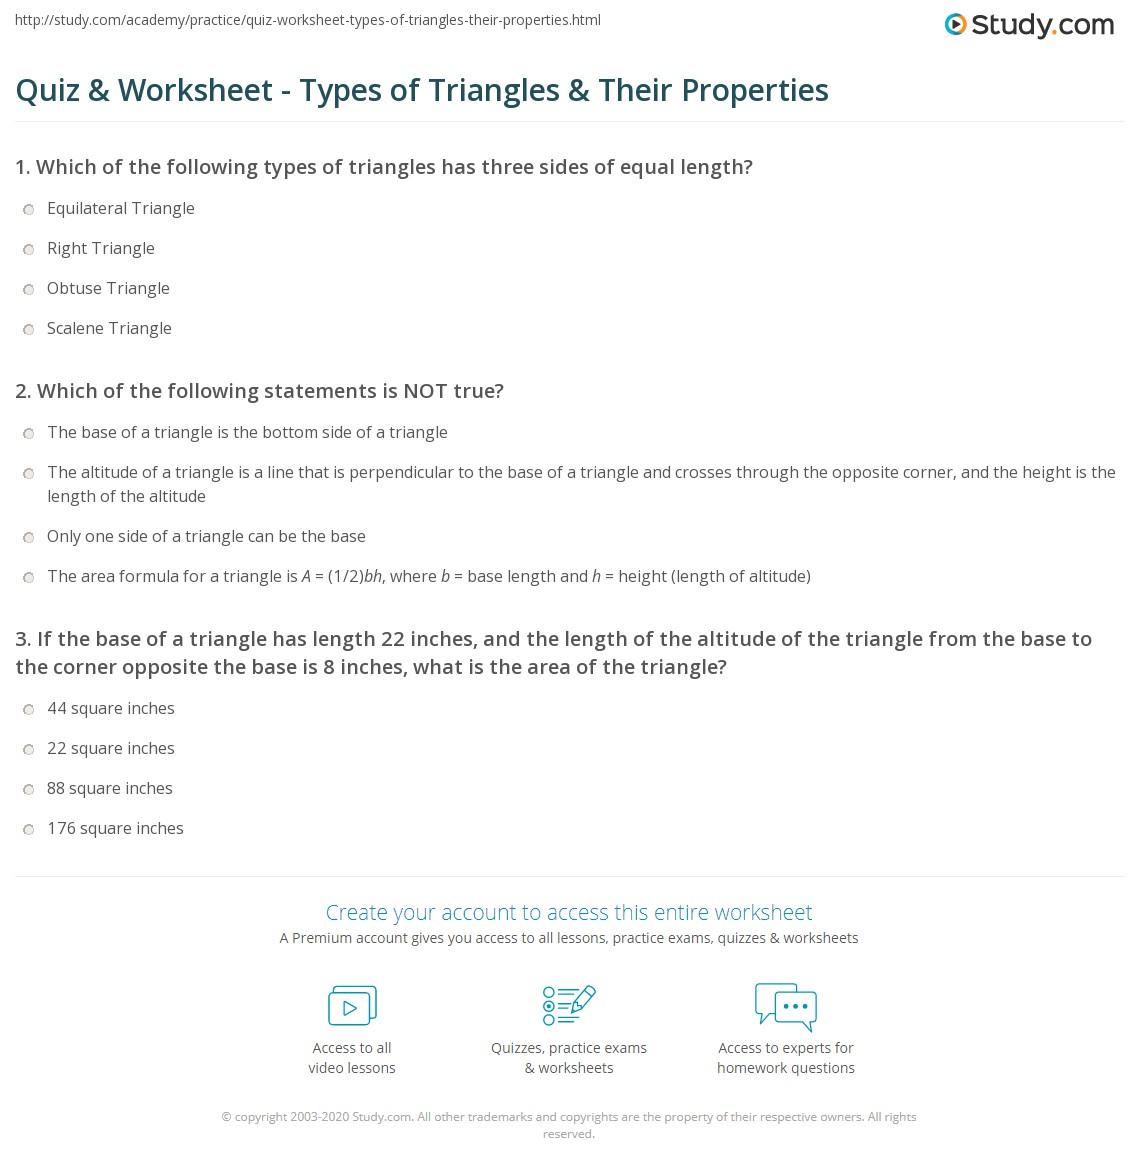 Worksheets Types Of Triangles Worksheet quiz worksheet types of triangles their properties study com print worksheet